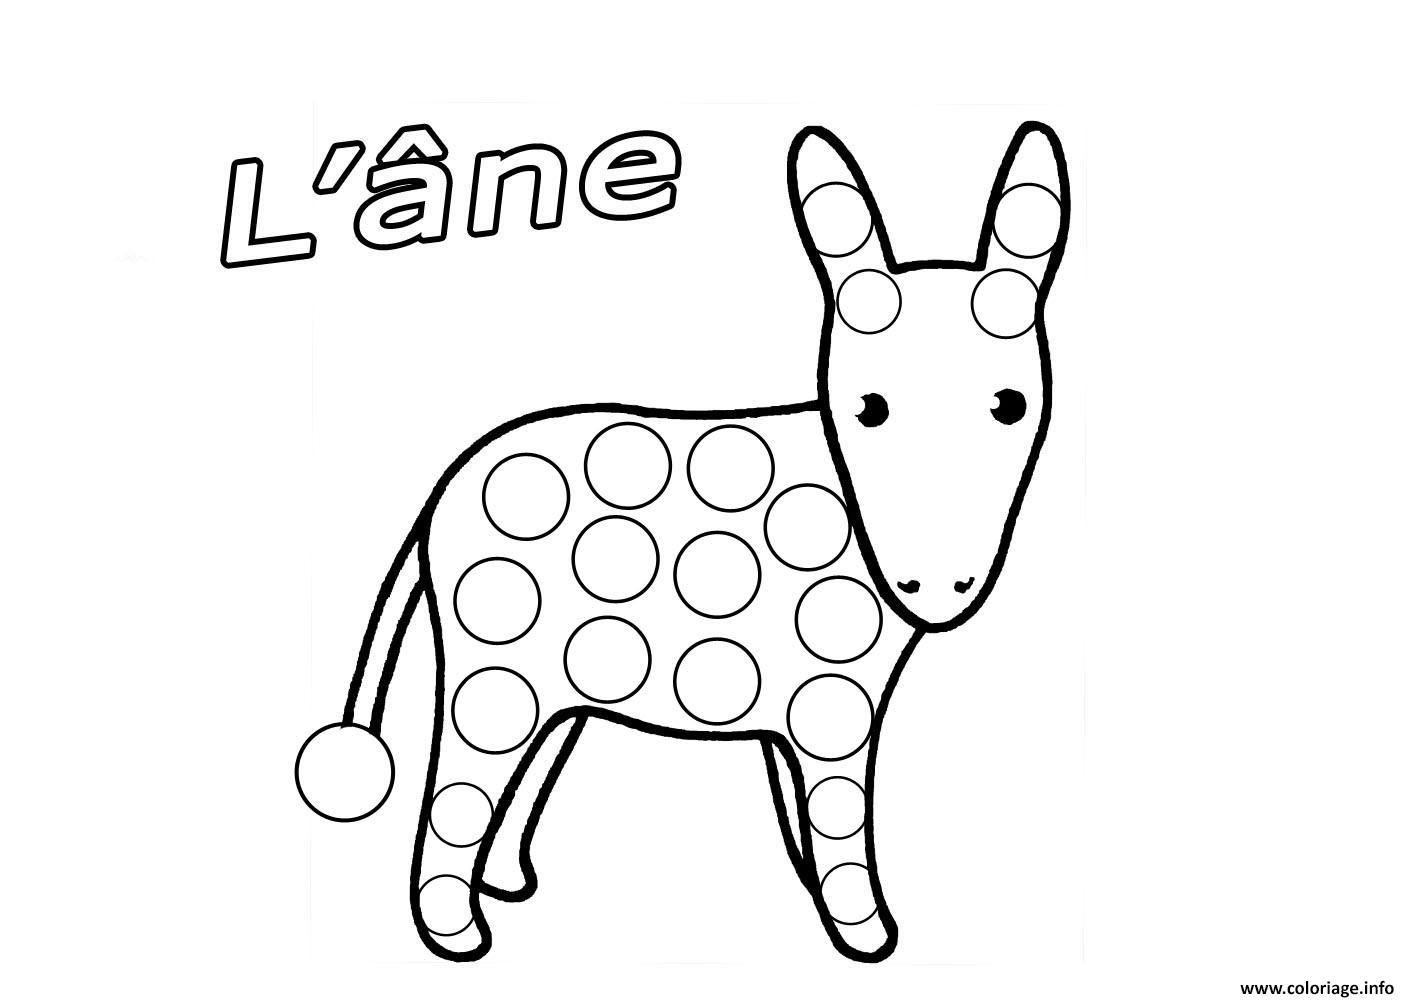 Coloriage petit ane dessin - Dessin ane facile ...